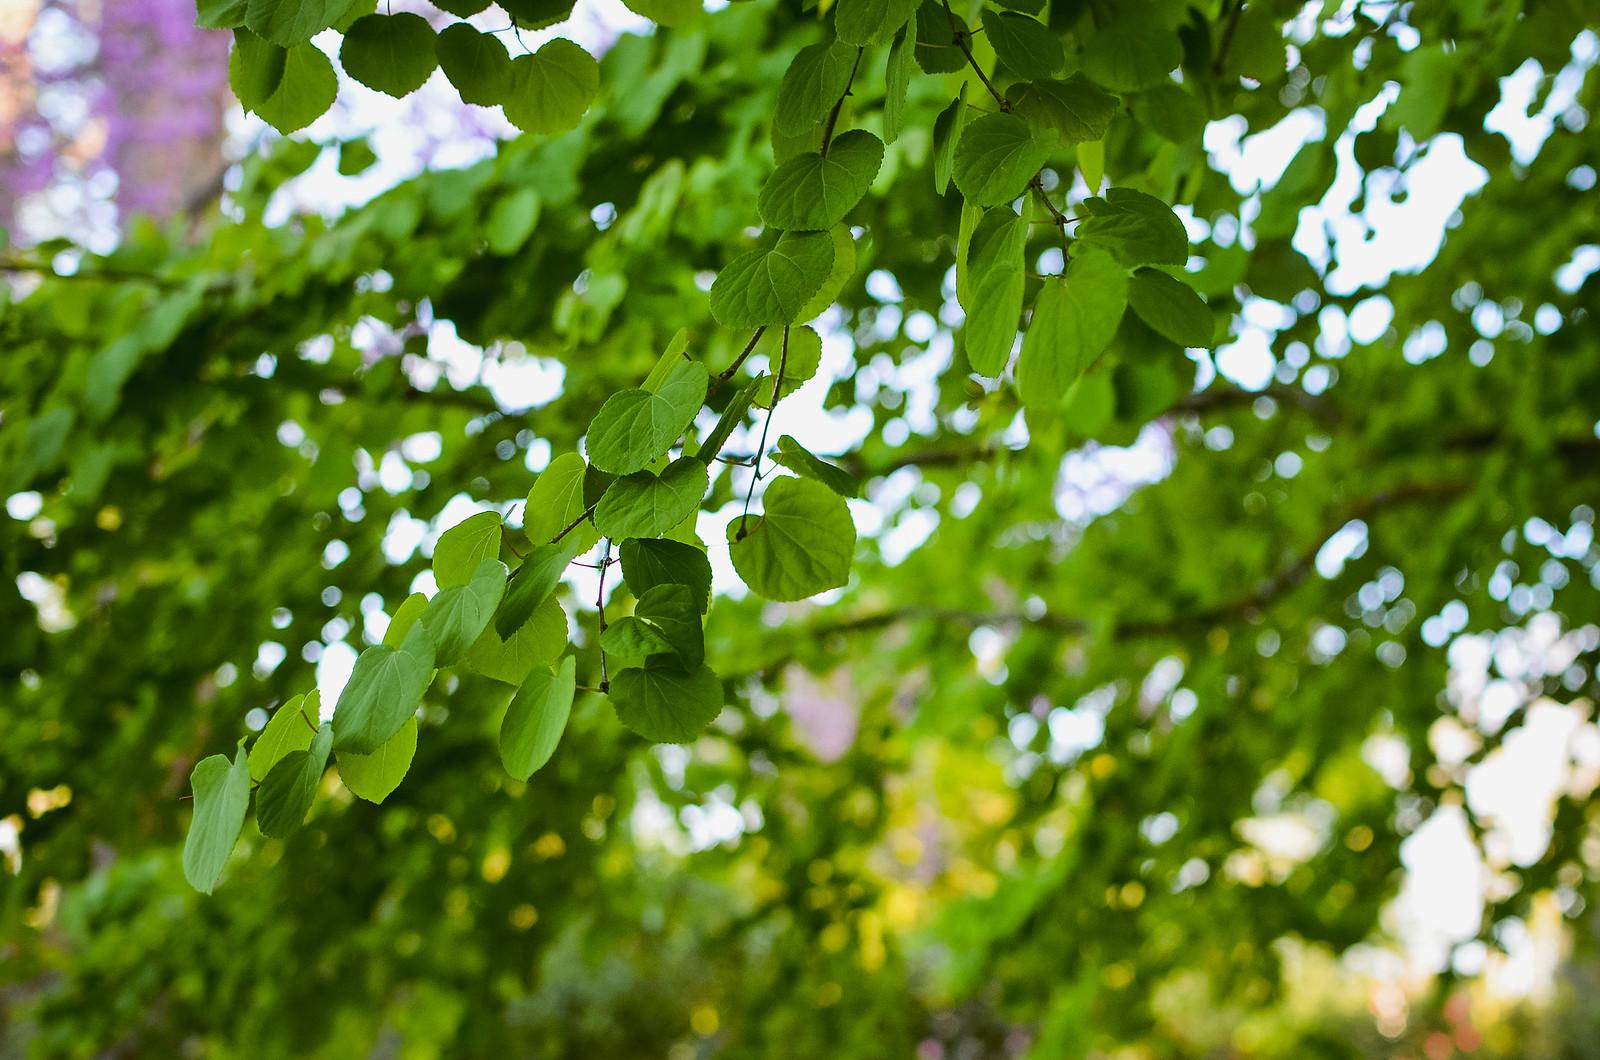 Escapade au jardin des plantes de nantes for Jardin des plantes nantes de nuit